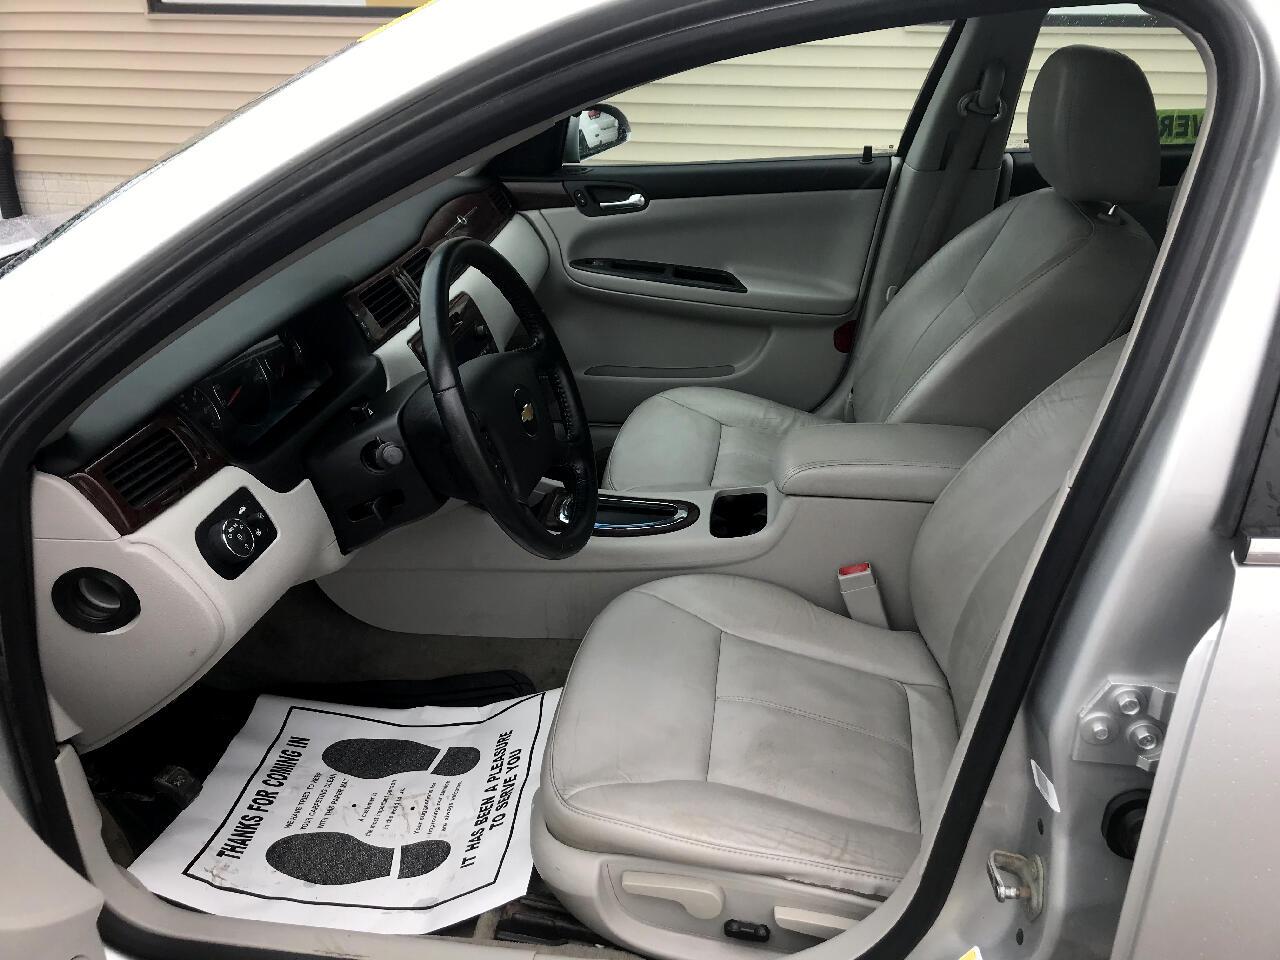 Chevrolet Impala 4dr Sdn LT Fleet 2011